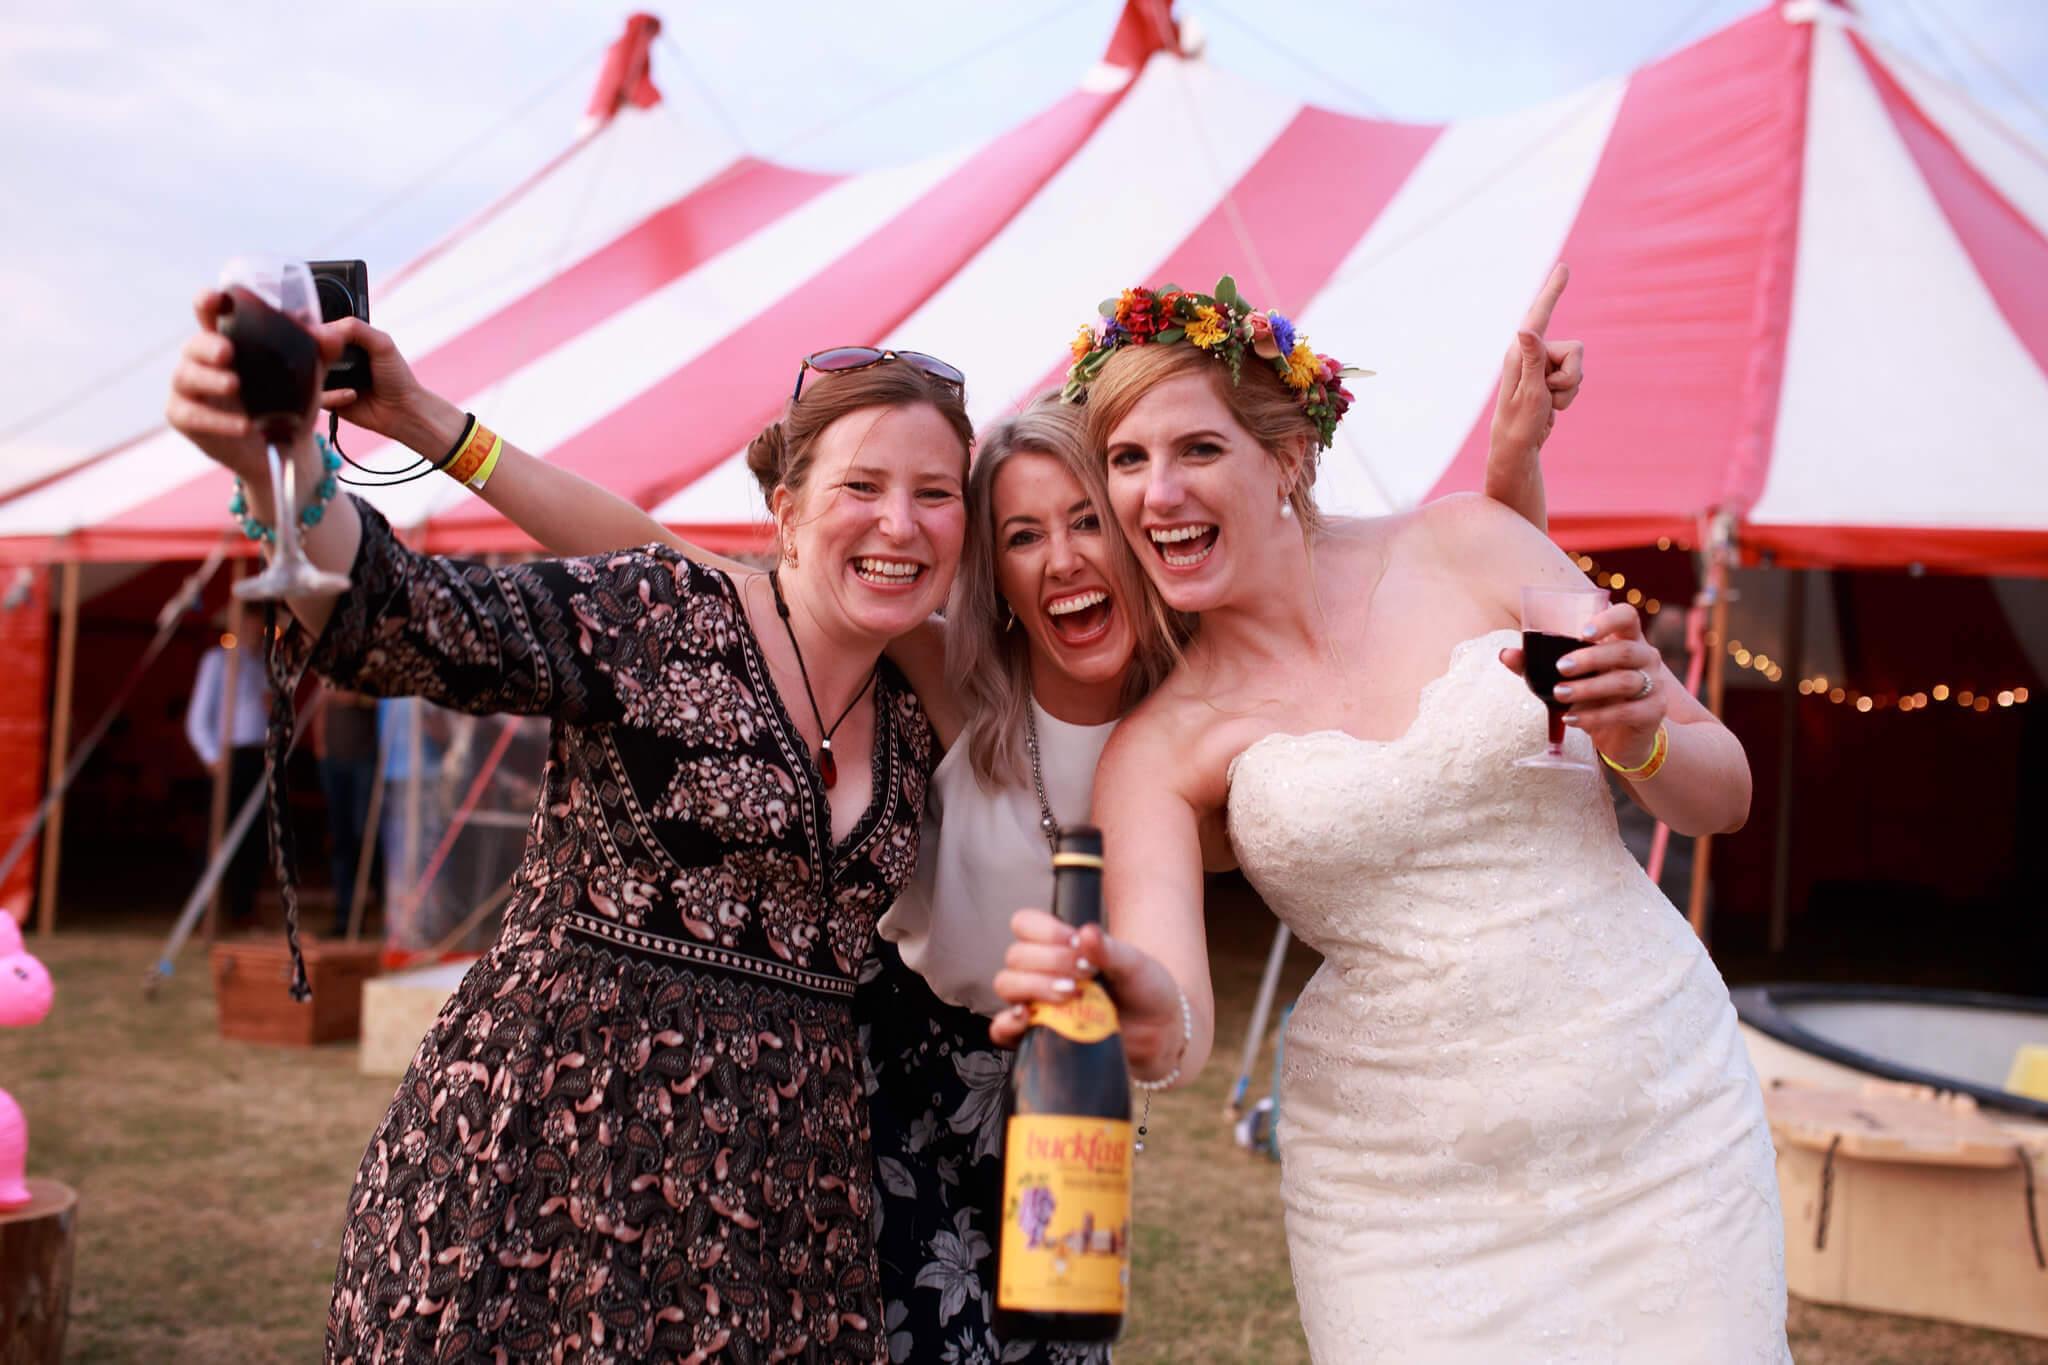 Guests posing at fun outdoor wedding